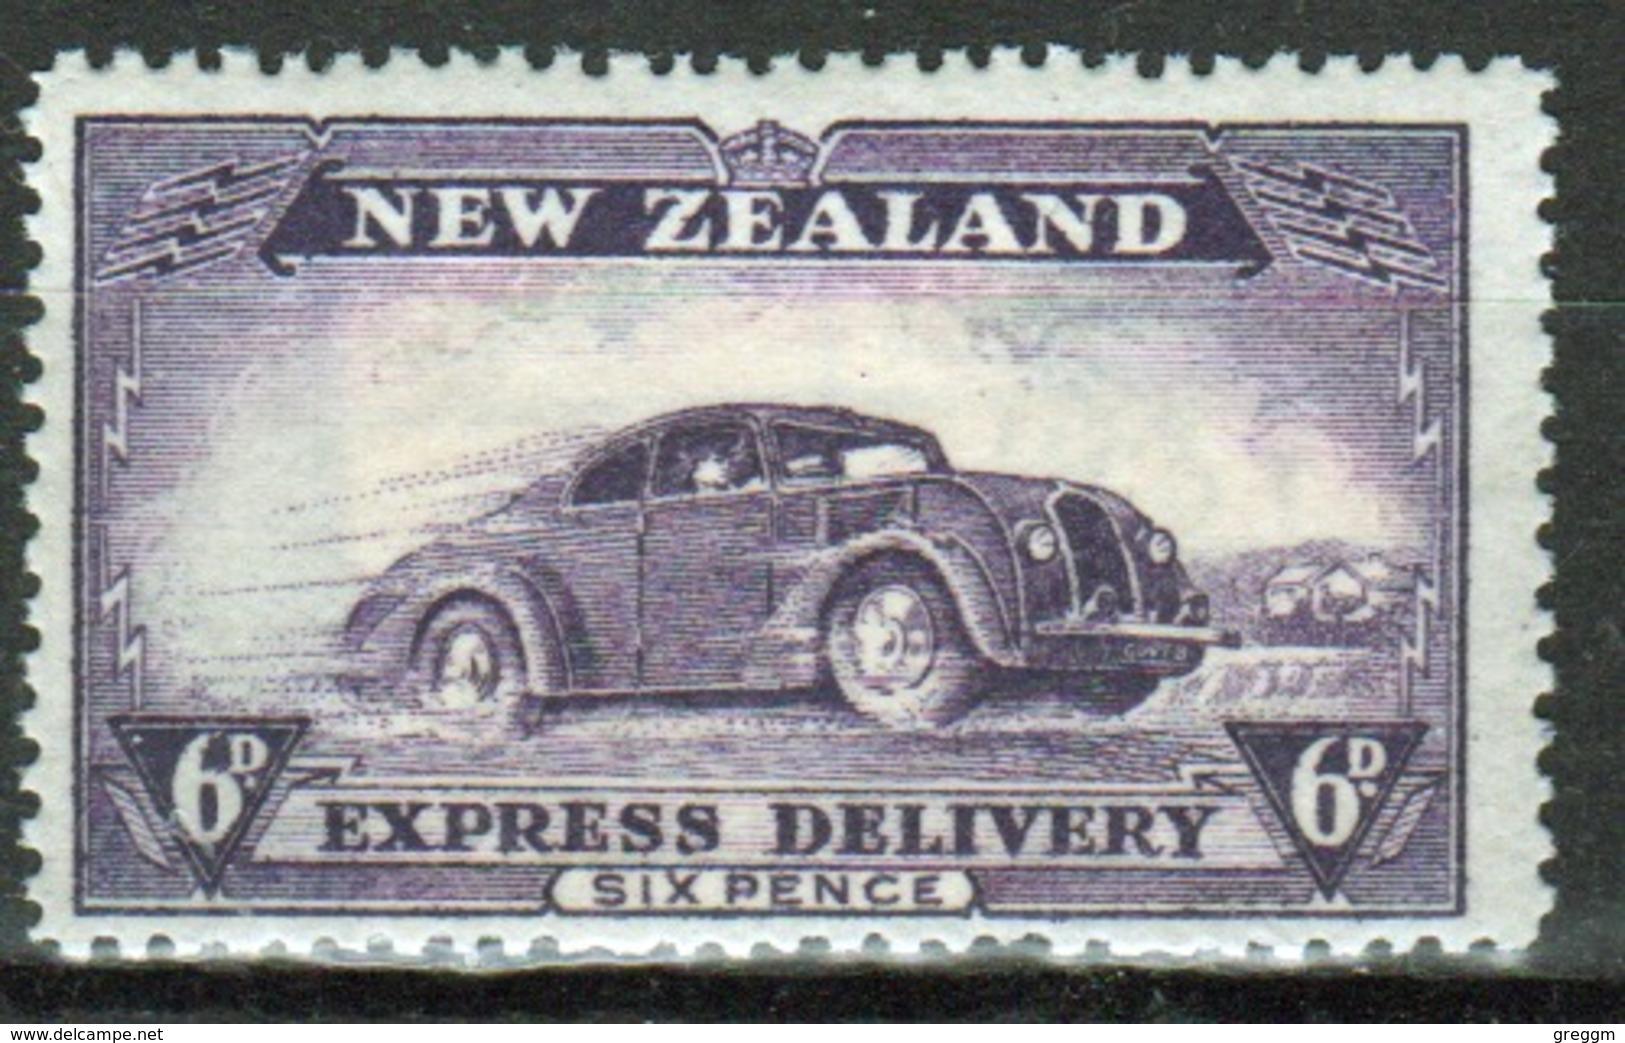 New Zealand 1939 Express Delivery George VI 6d Violet Single Stamp. - Express Delivery Stamps